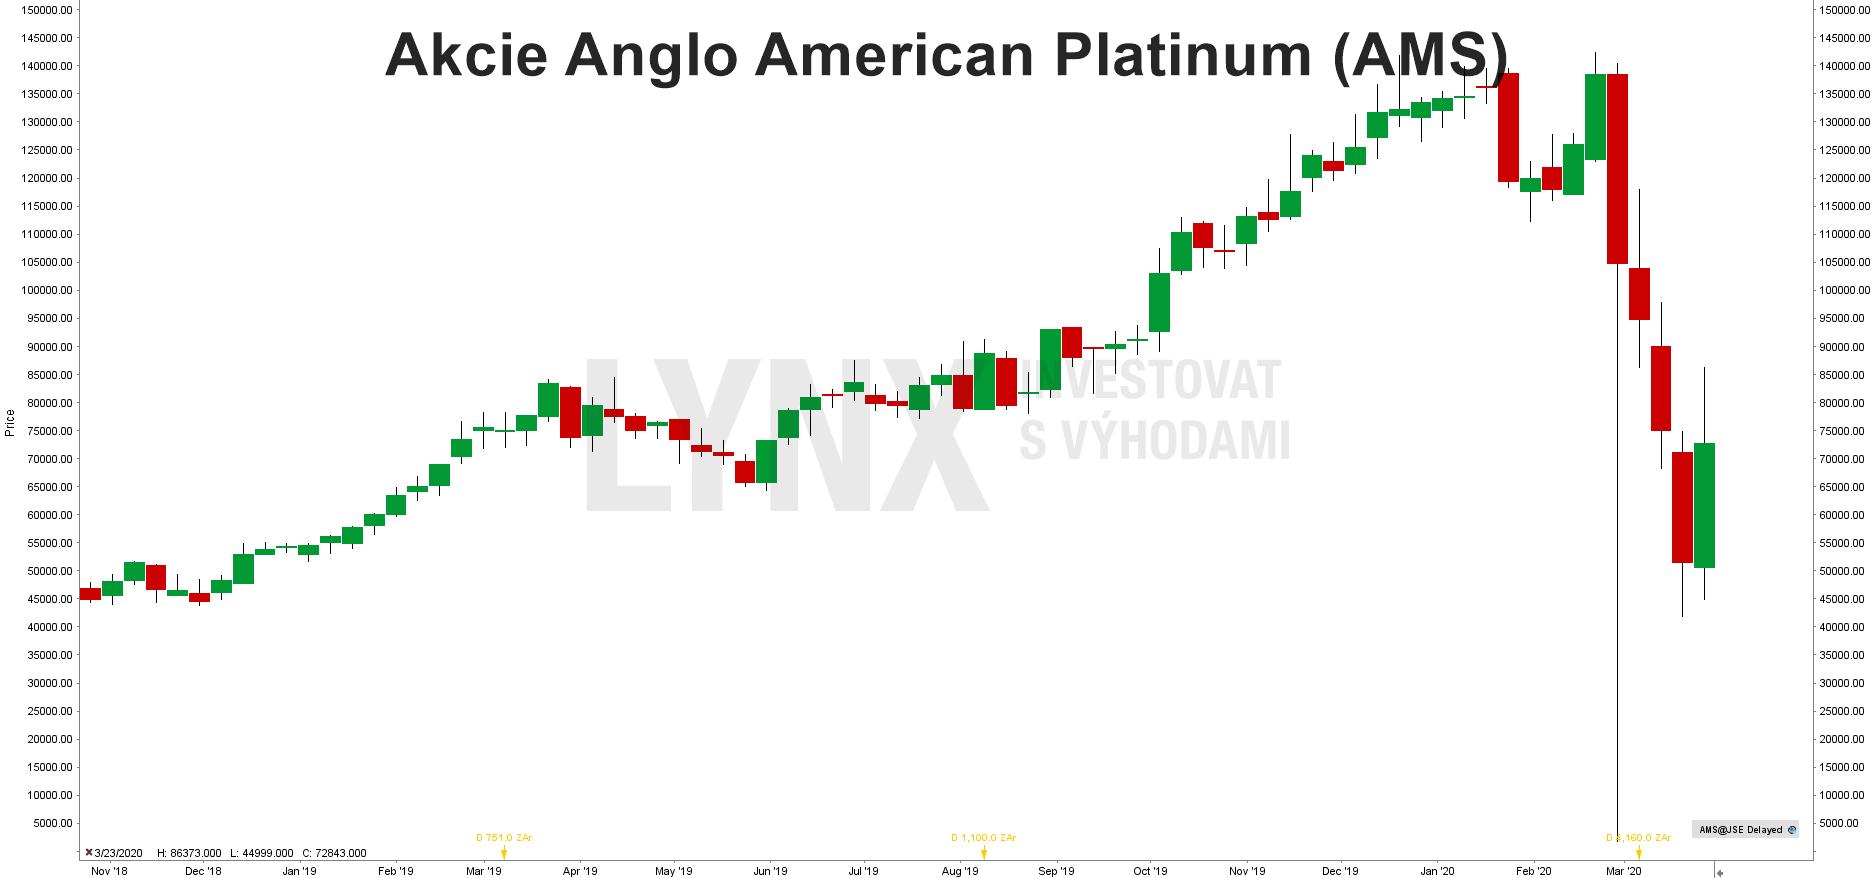 Akcie Anglo American Platinum (AMS)